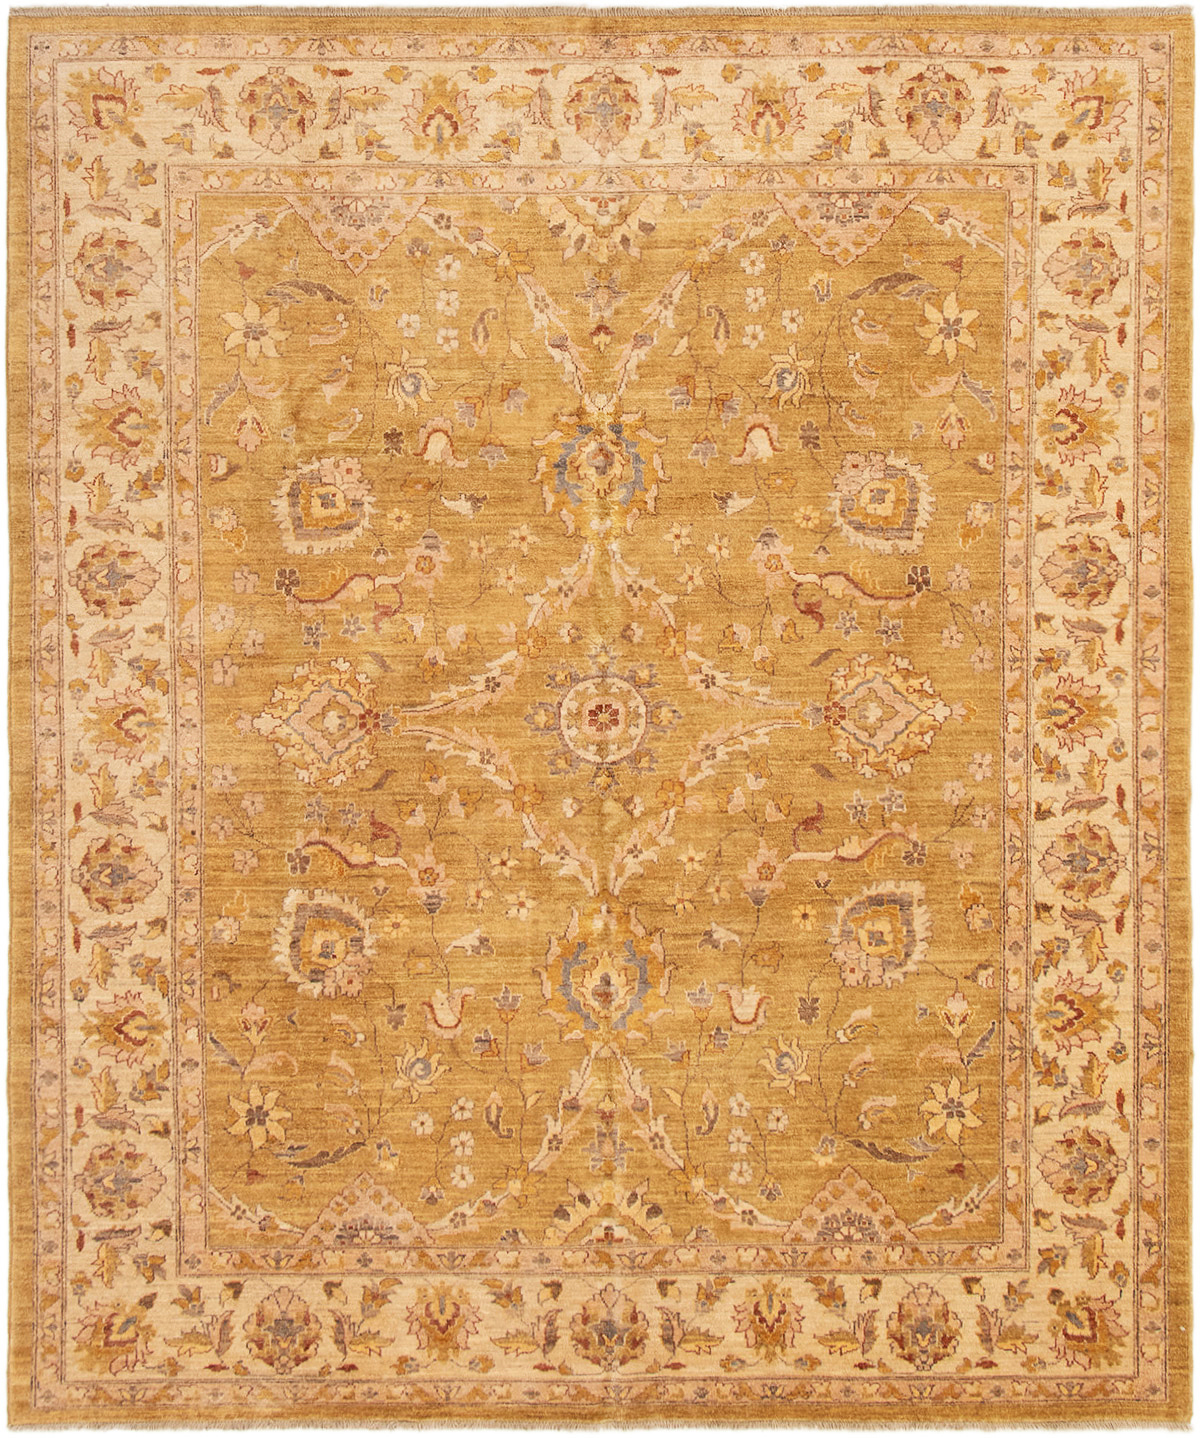 "Hand-knotted Chobi Finest Dark Gold Wool Rug 8'5"" x 10'0"" Size: 8'5"" x 10'0"""